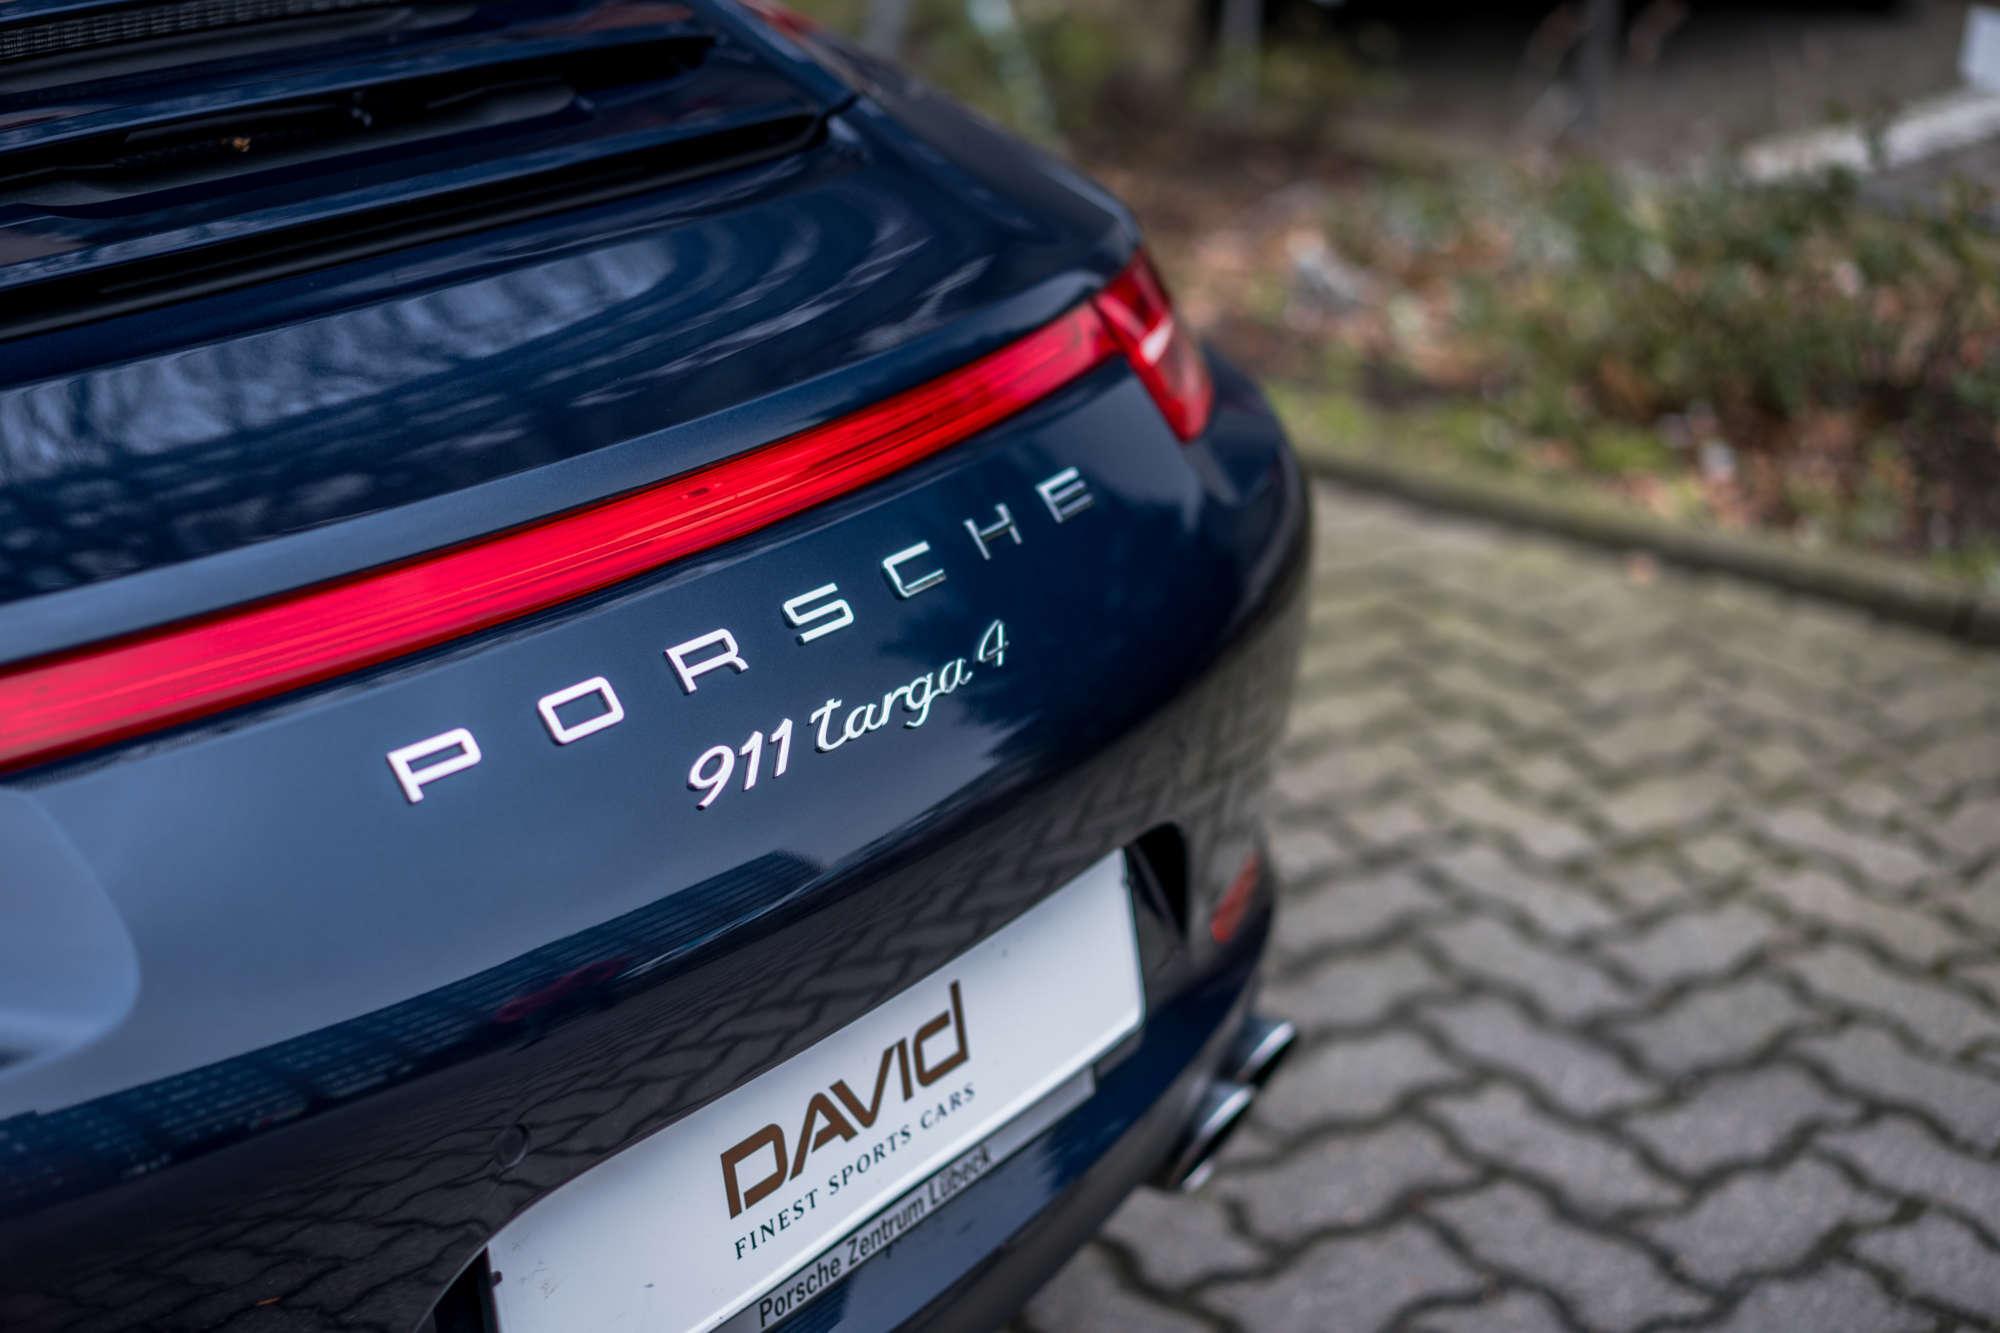 Porsche 991 1 Carrera (S) - For sale & Buyer's Guide